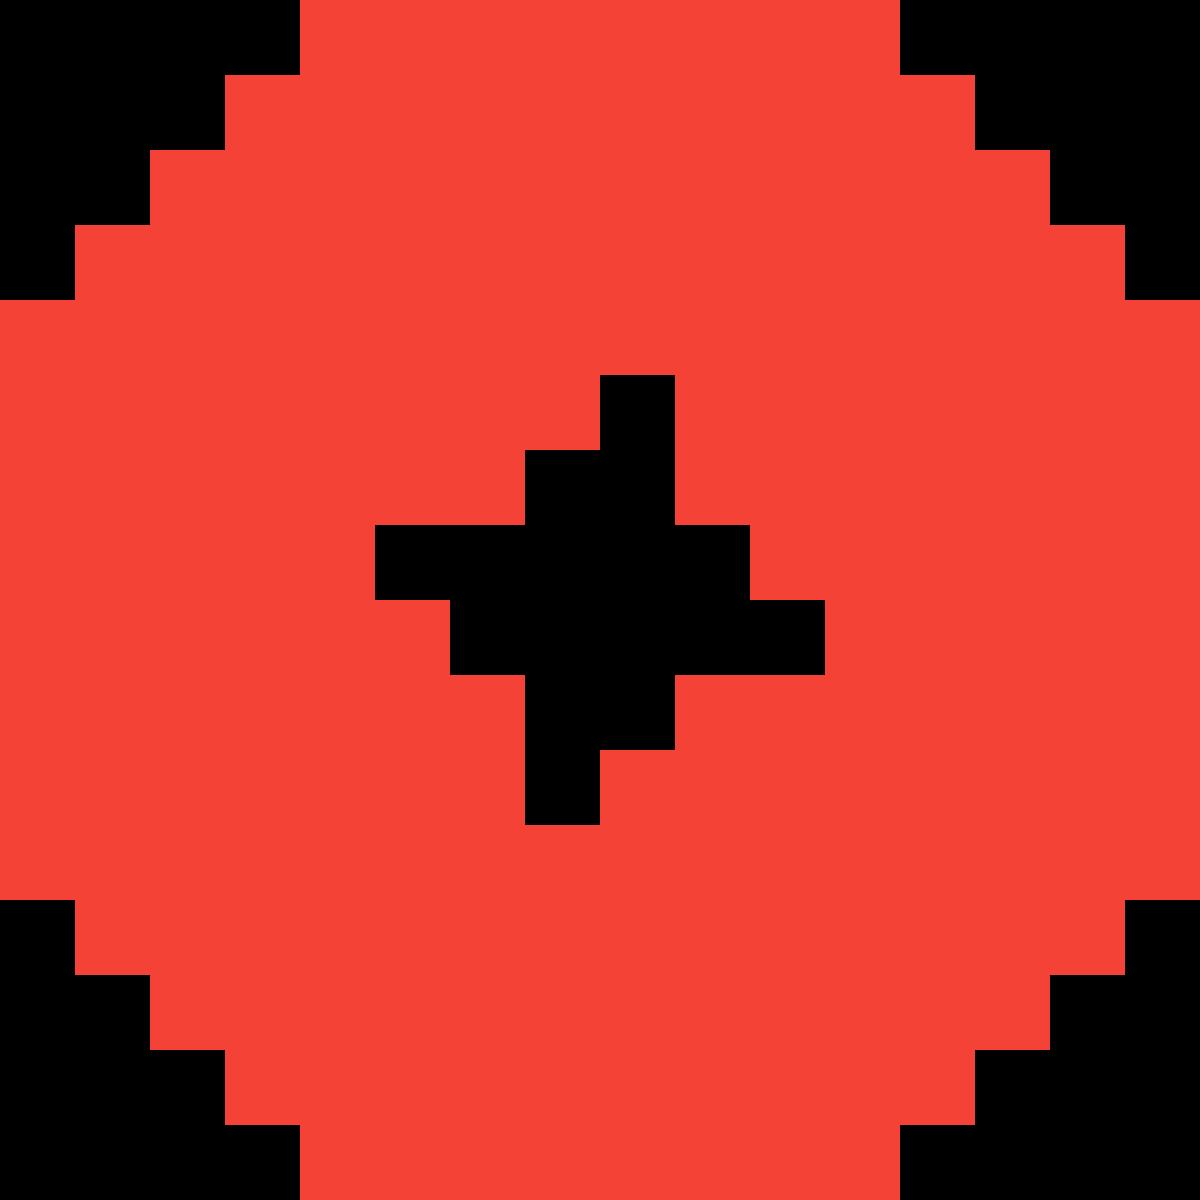 Pixilart Roblox Logo 2 By Vincent09089